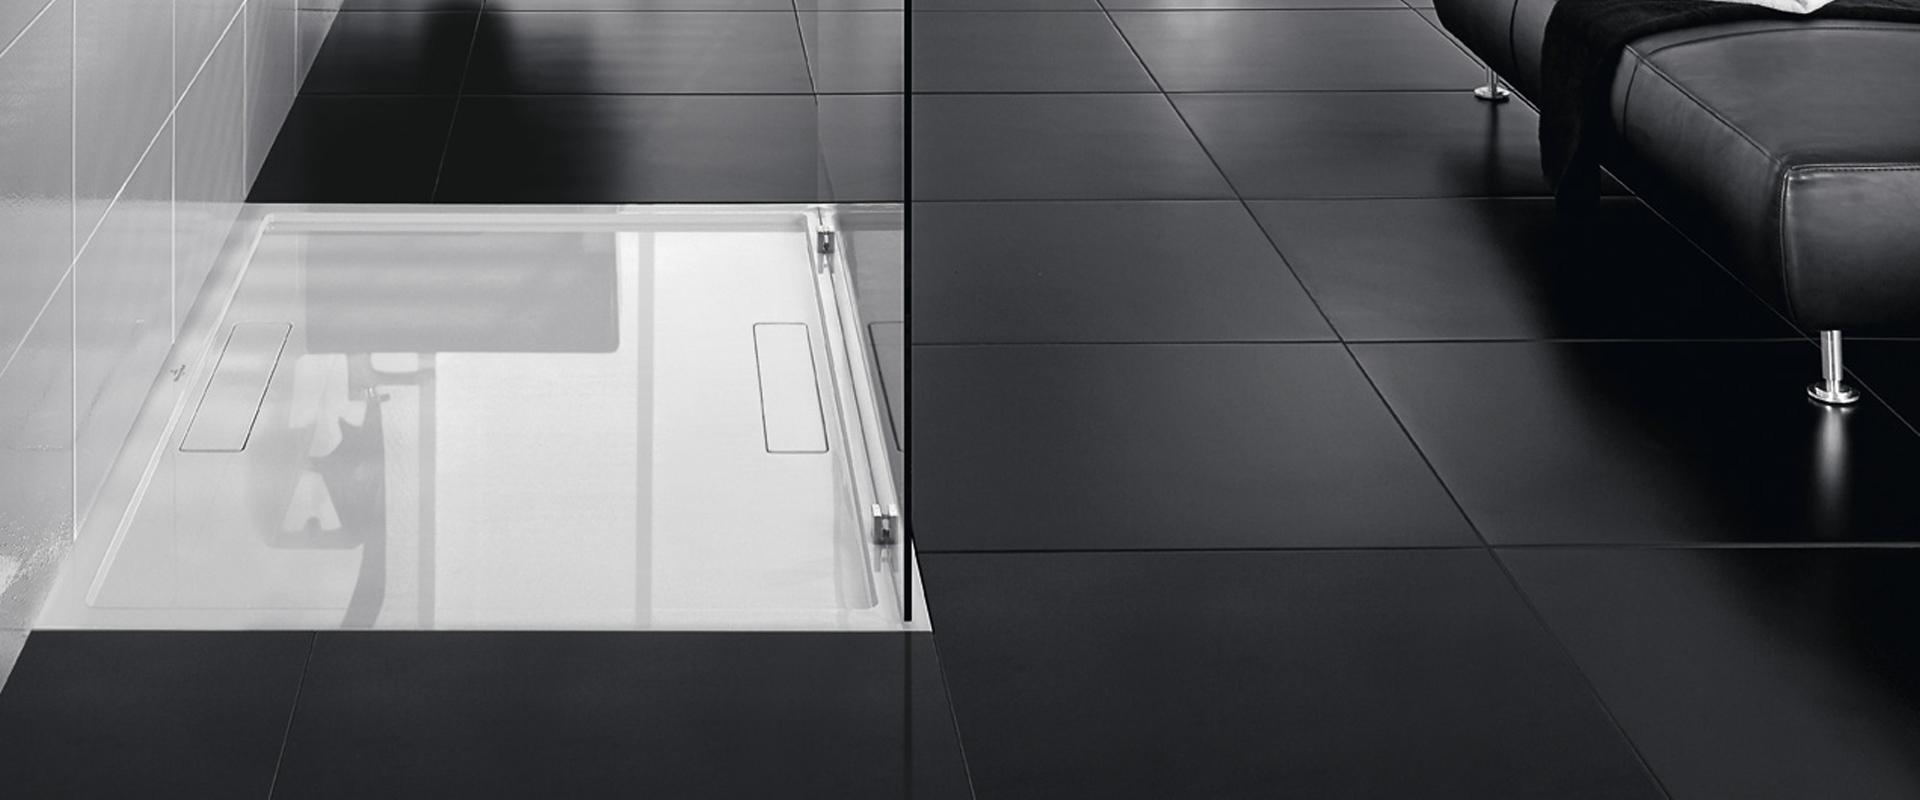 quaryl la nature perfectionn e villeroy boch. Black Bedroom Furniture Sets. Home Design Ideas